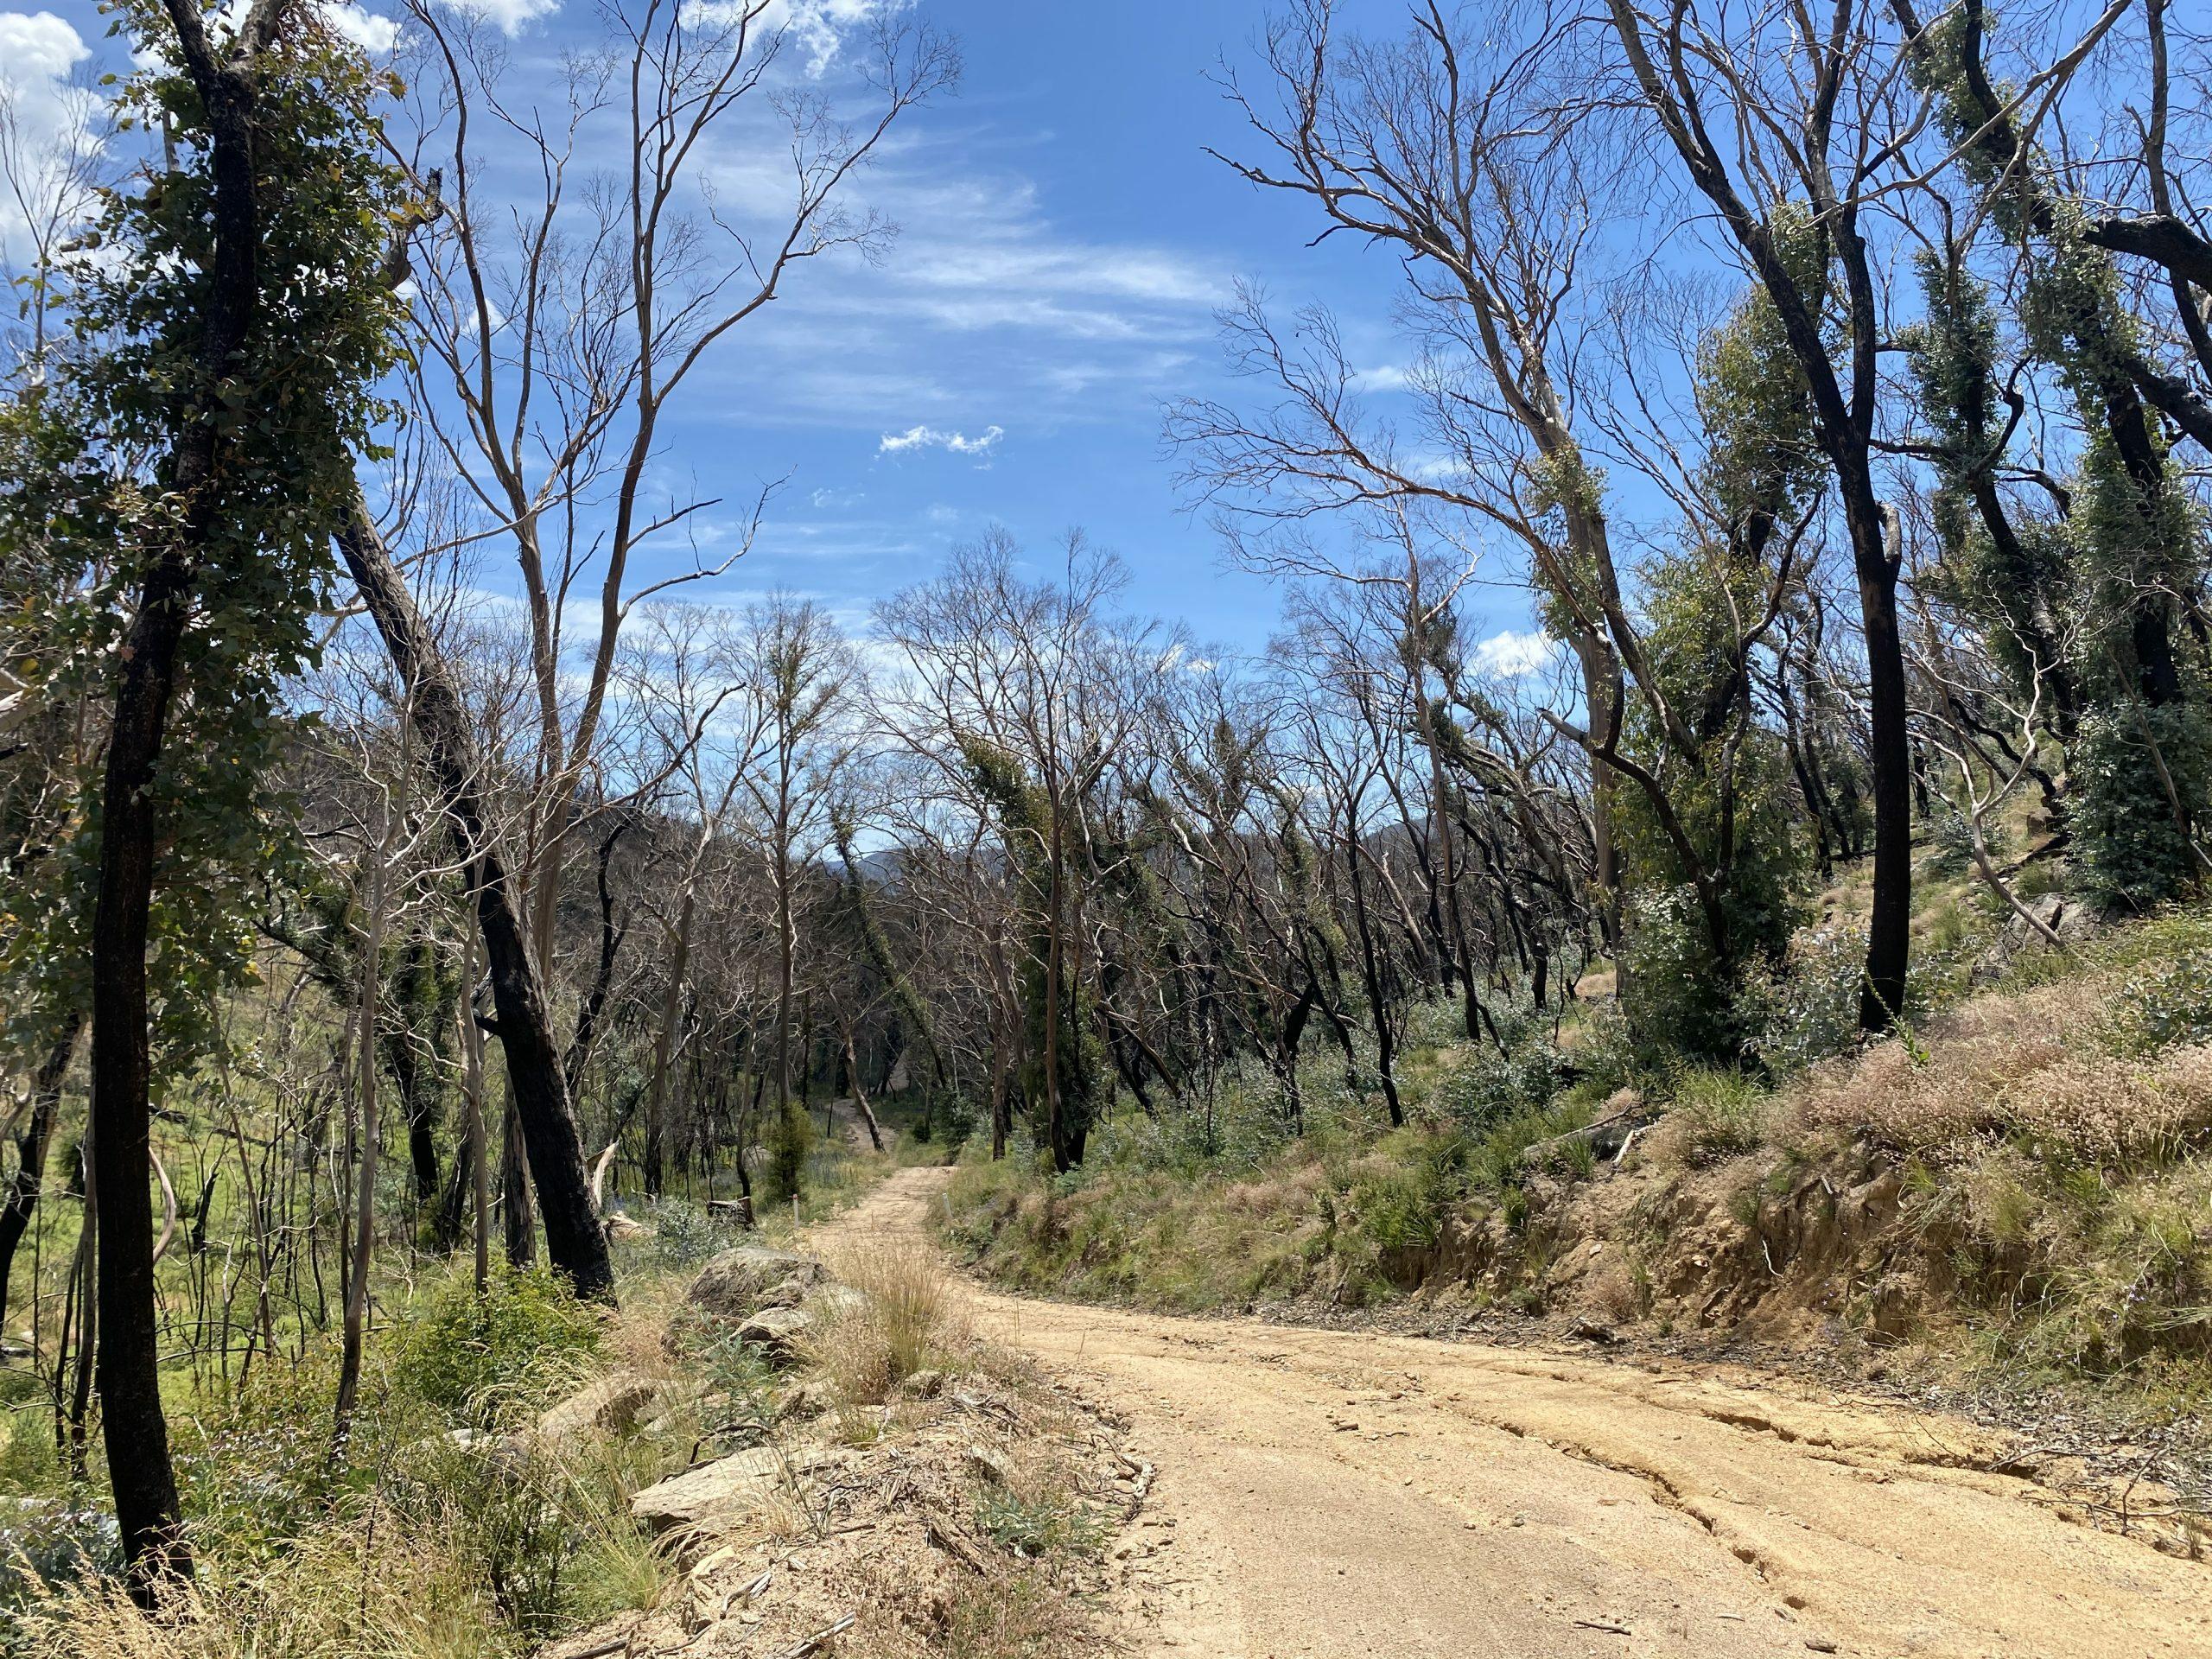 Naas Road fire trail